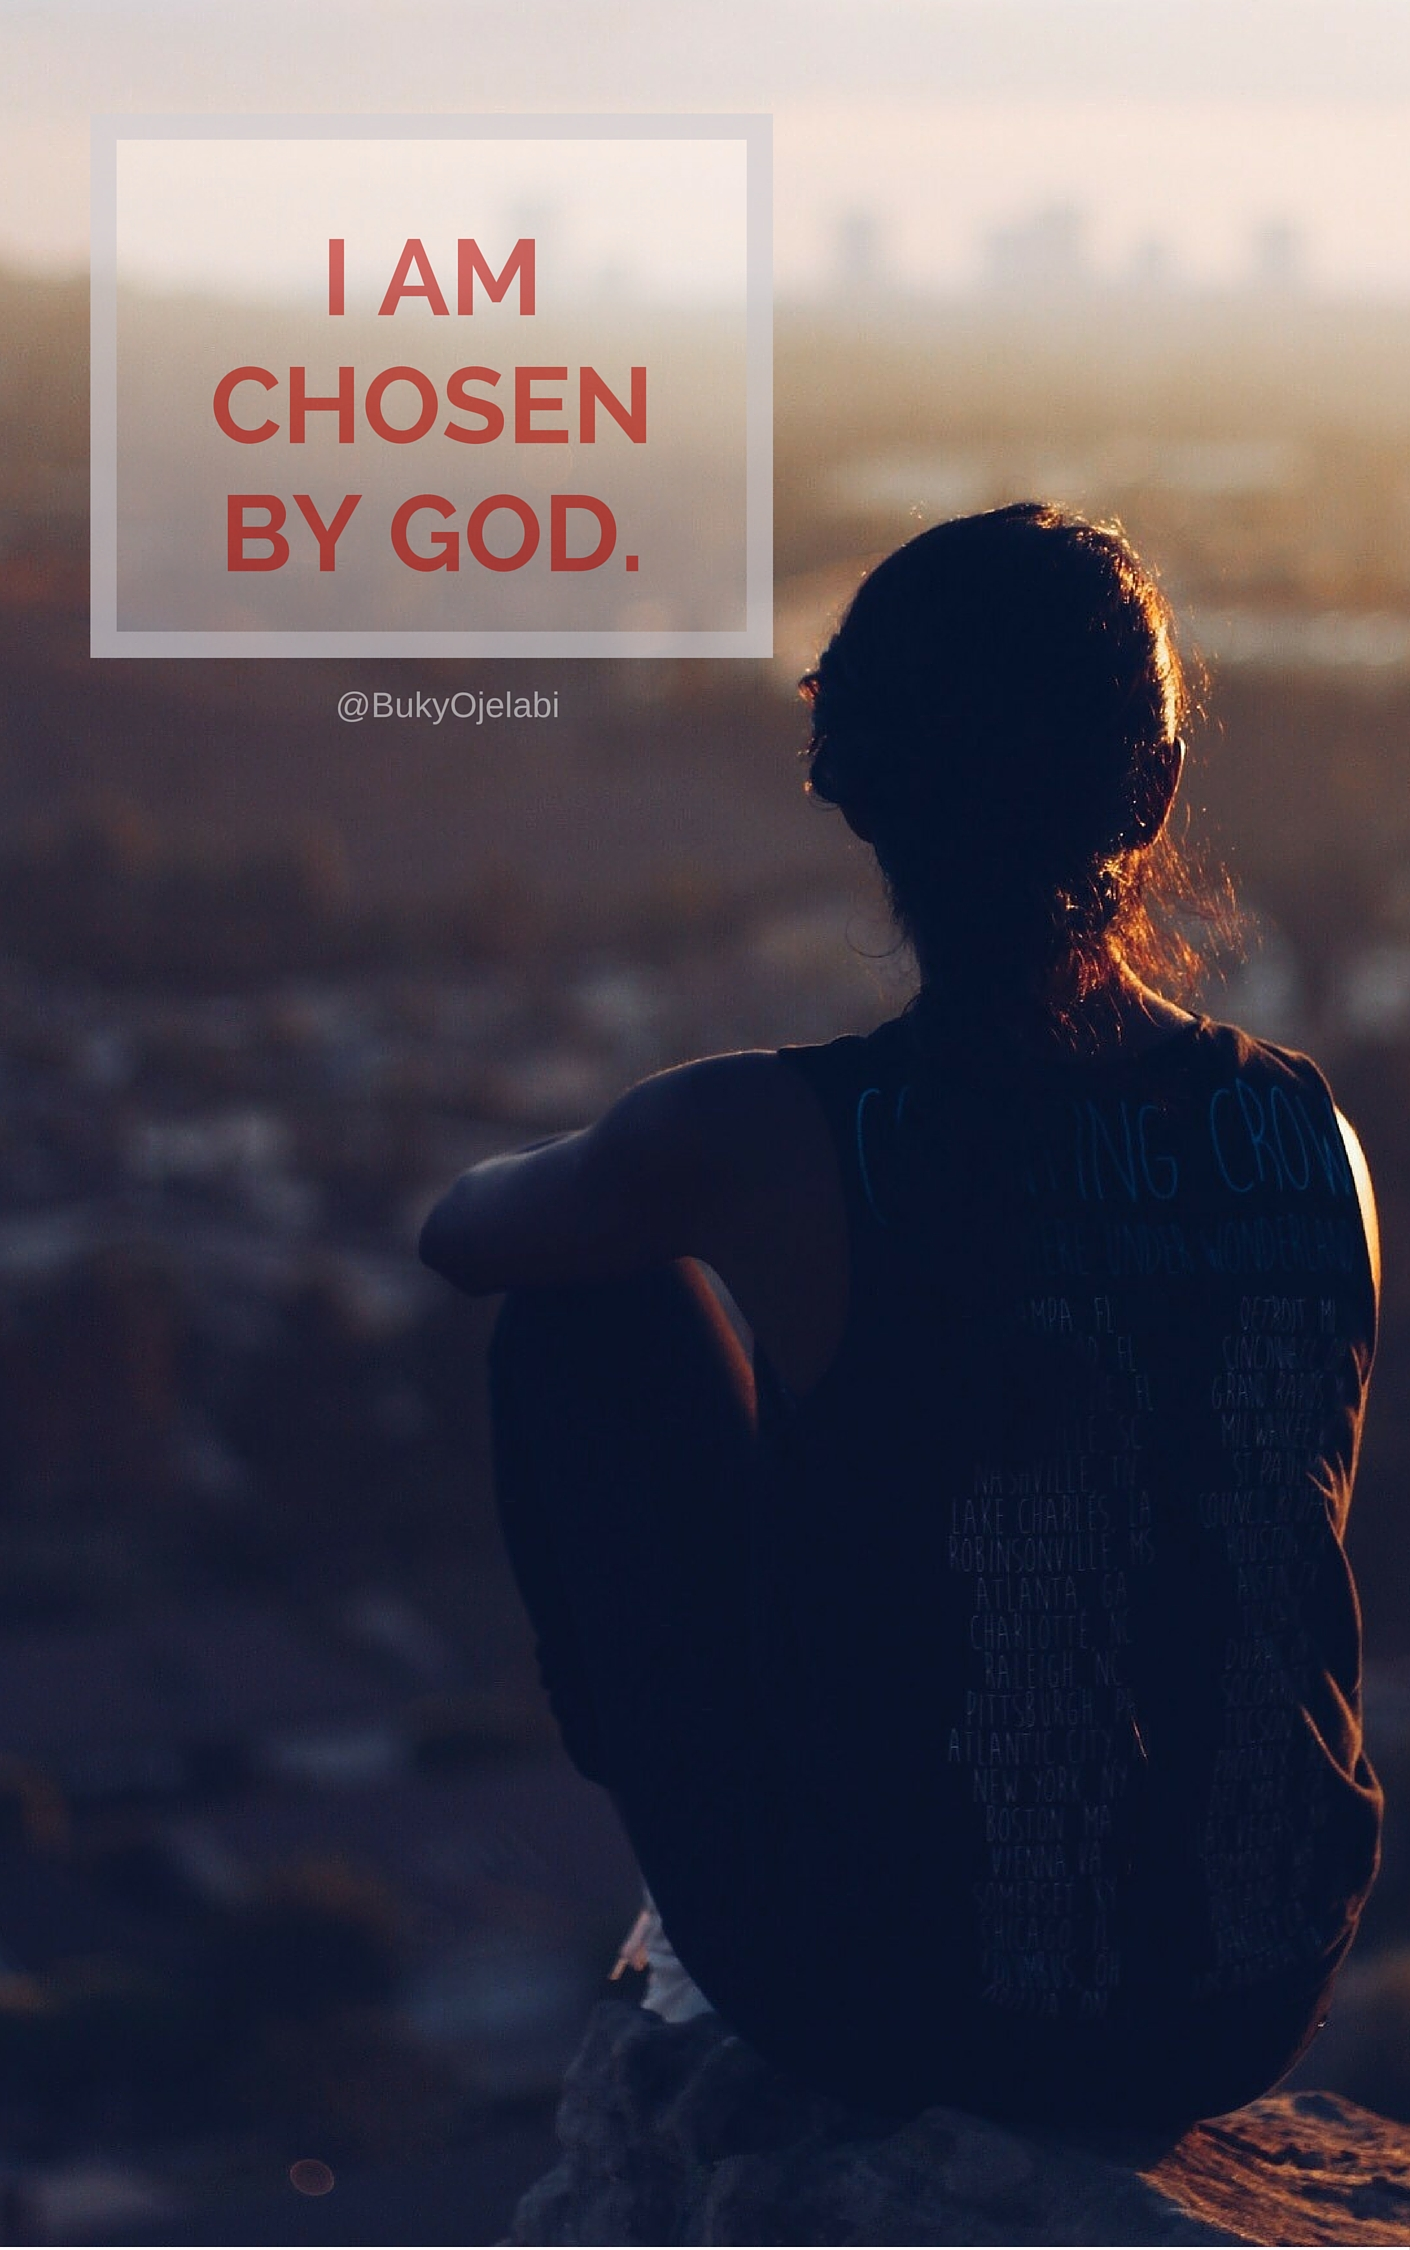 I AM CHOSEN BY GOD